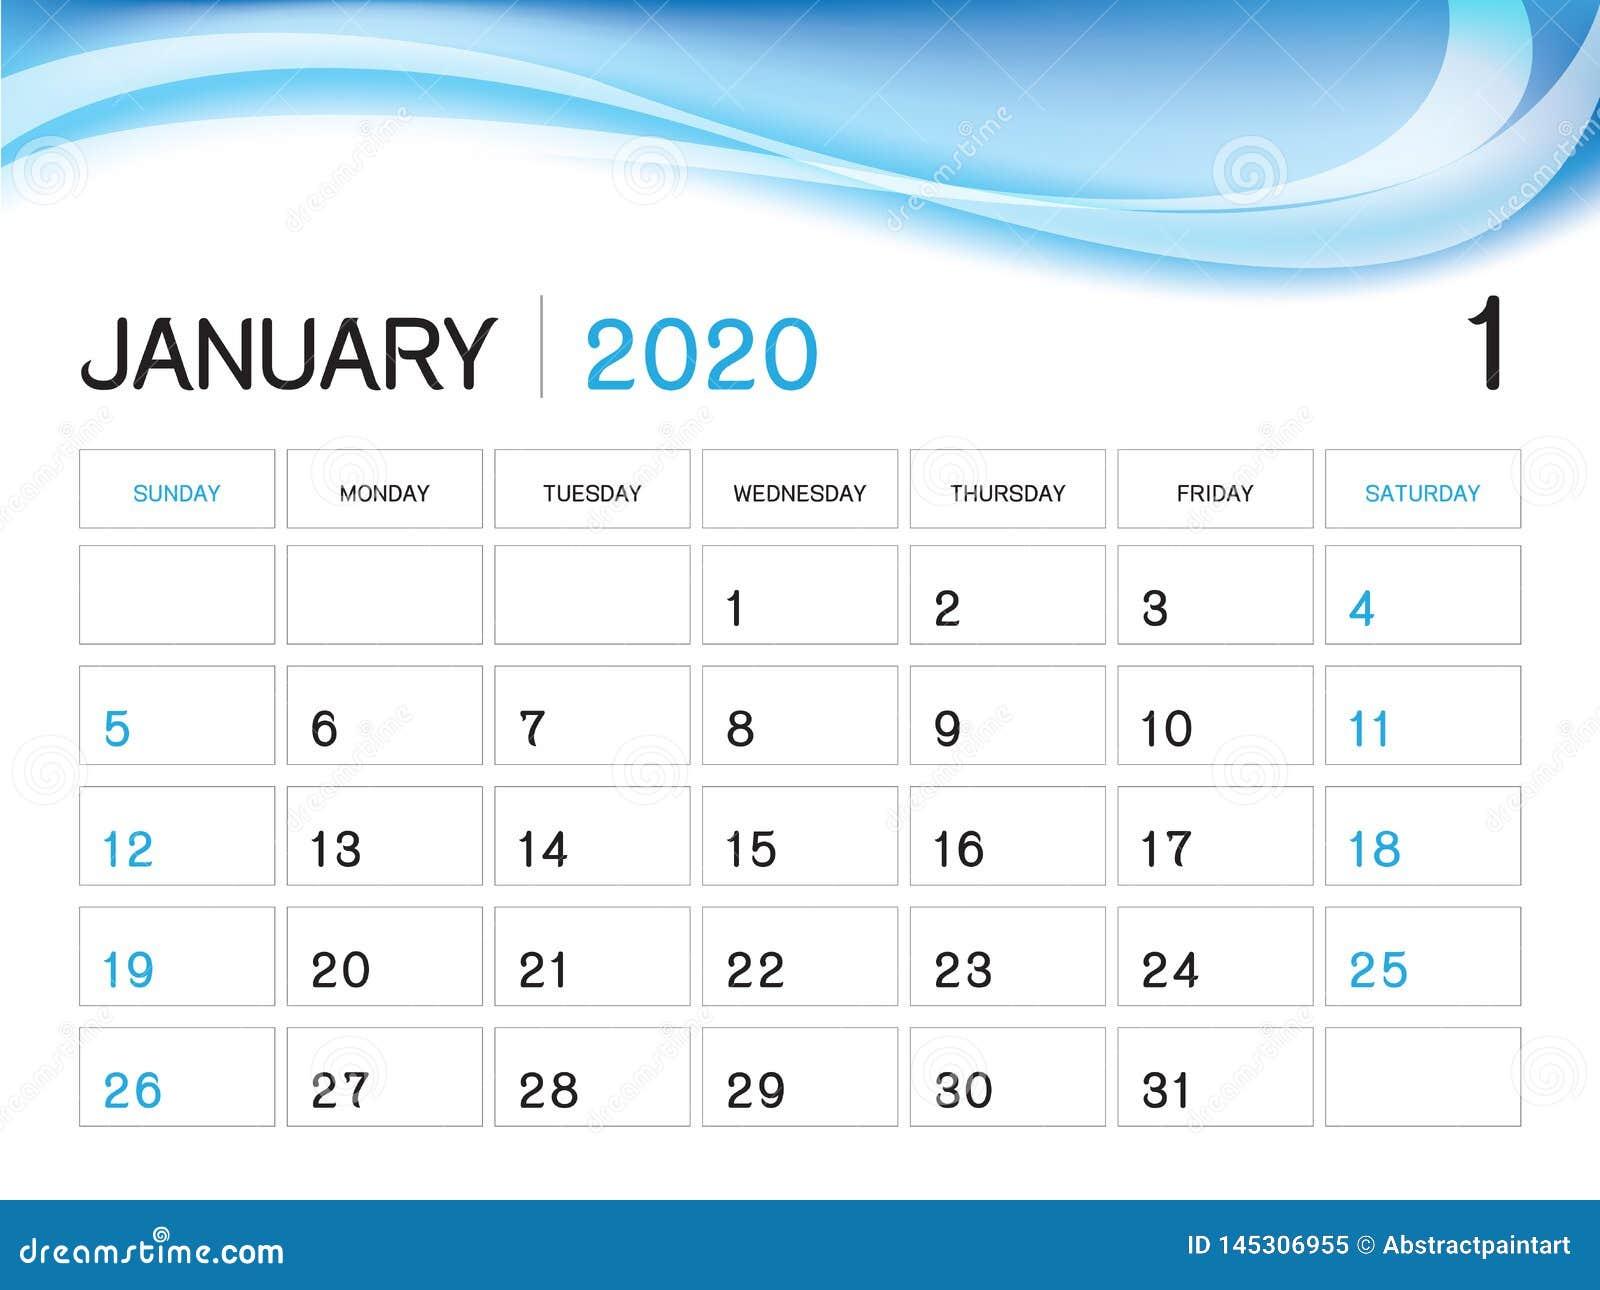 Printable Calendar January Weeks 2020 January 2020 Year Template, Calendar 2020 Vector, Desk Calendar